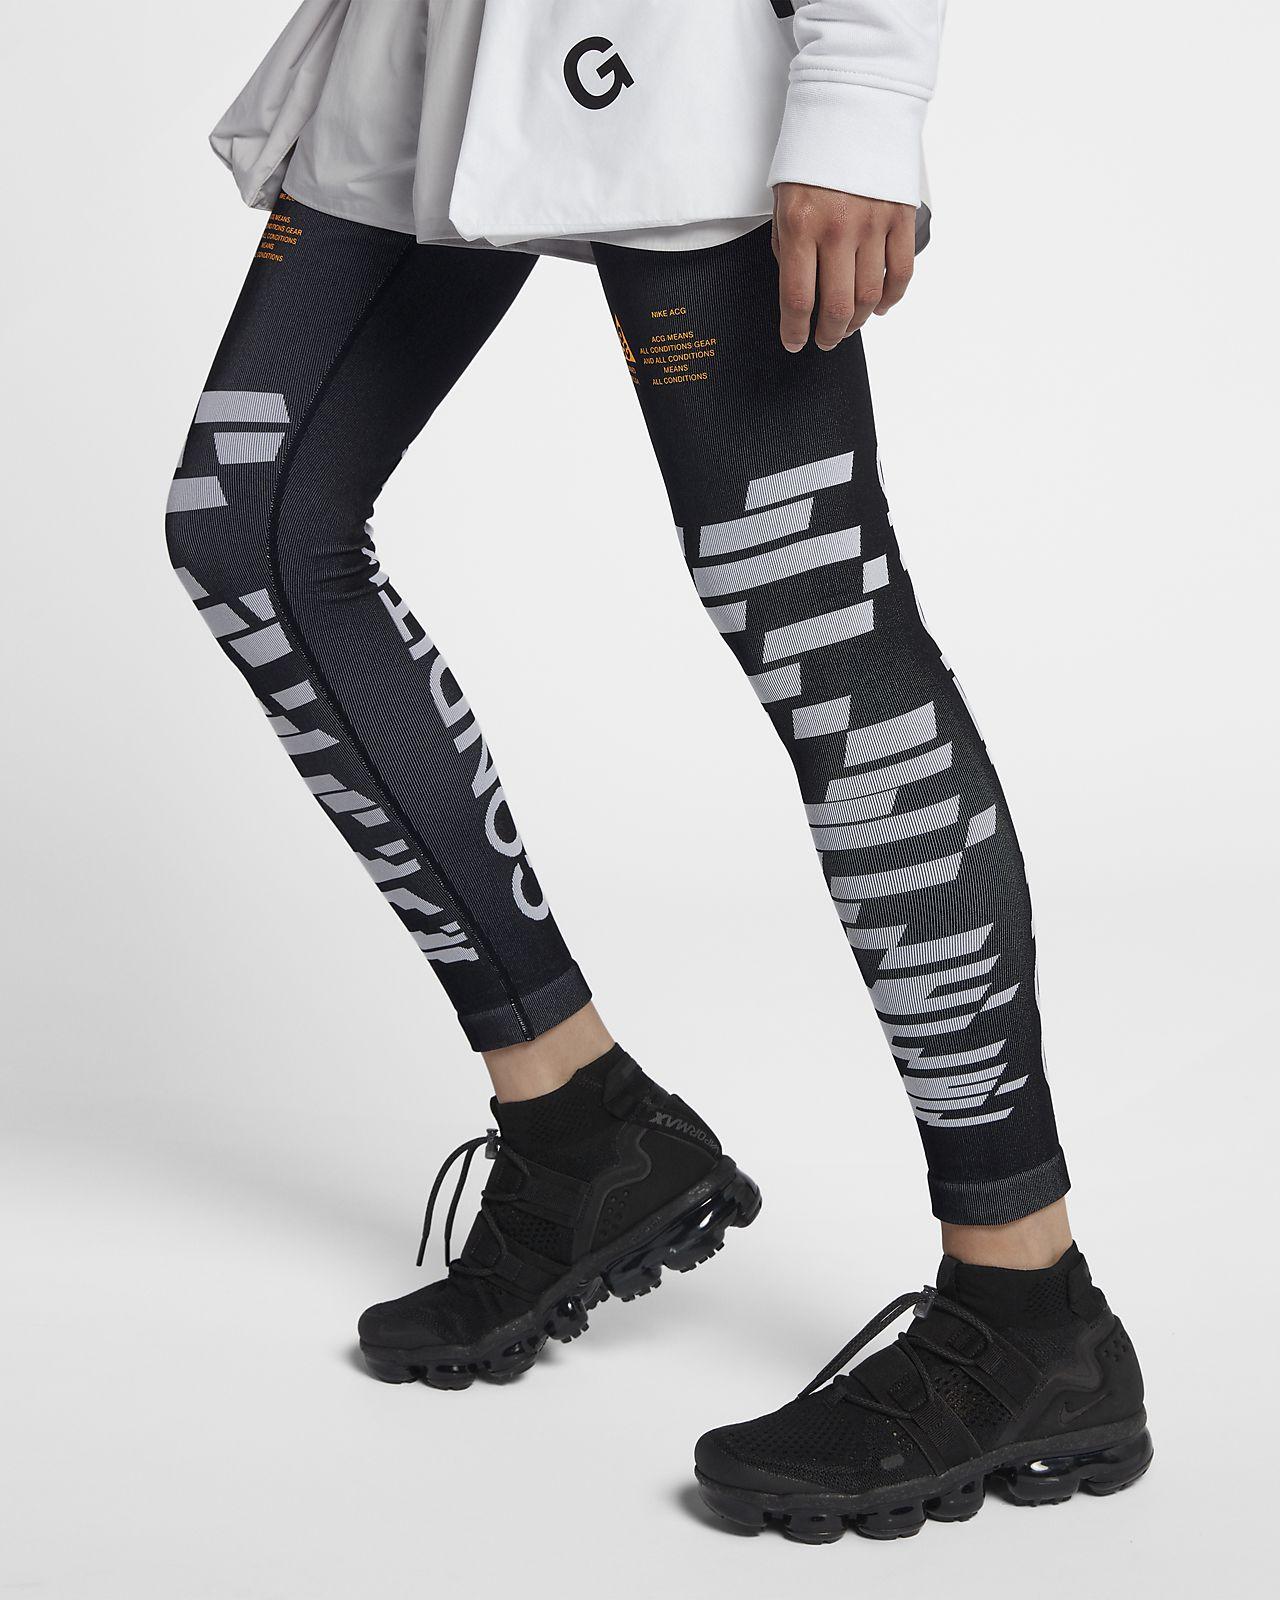 NikeLab ACG Women's Leg Sleeves